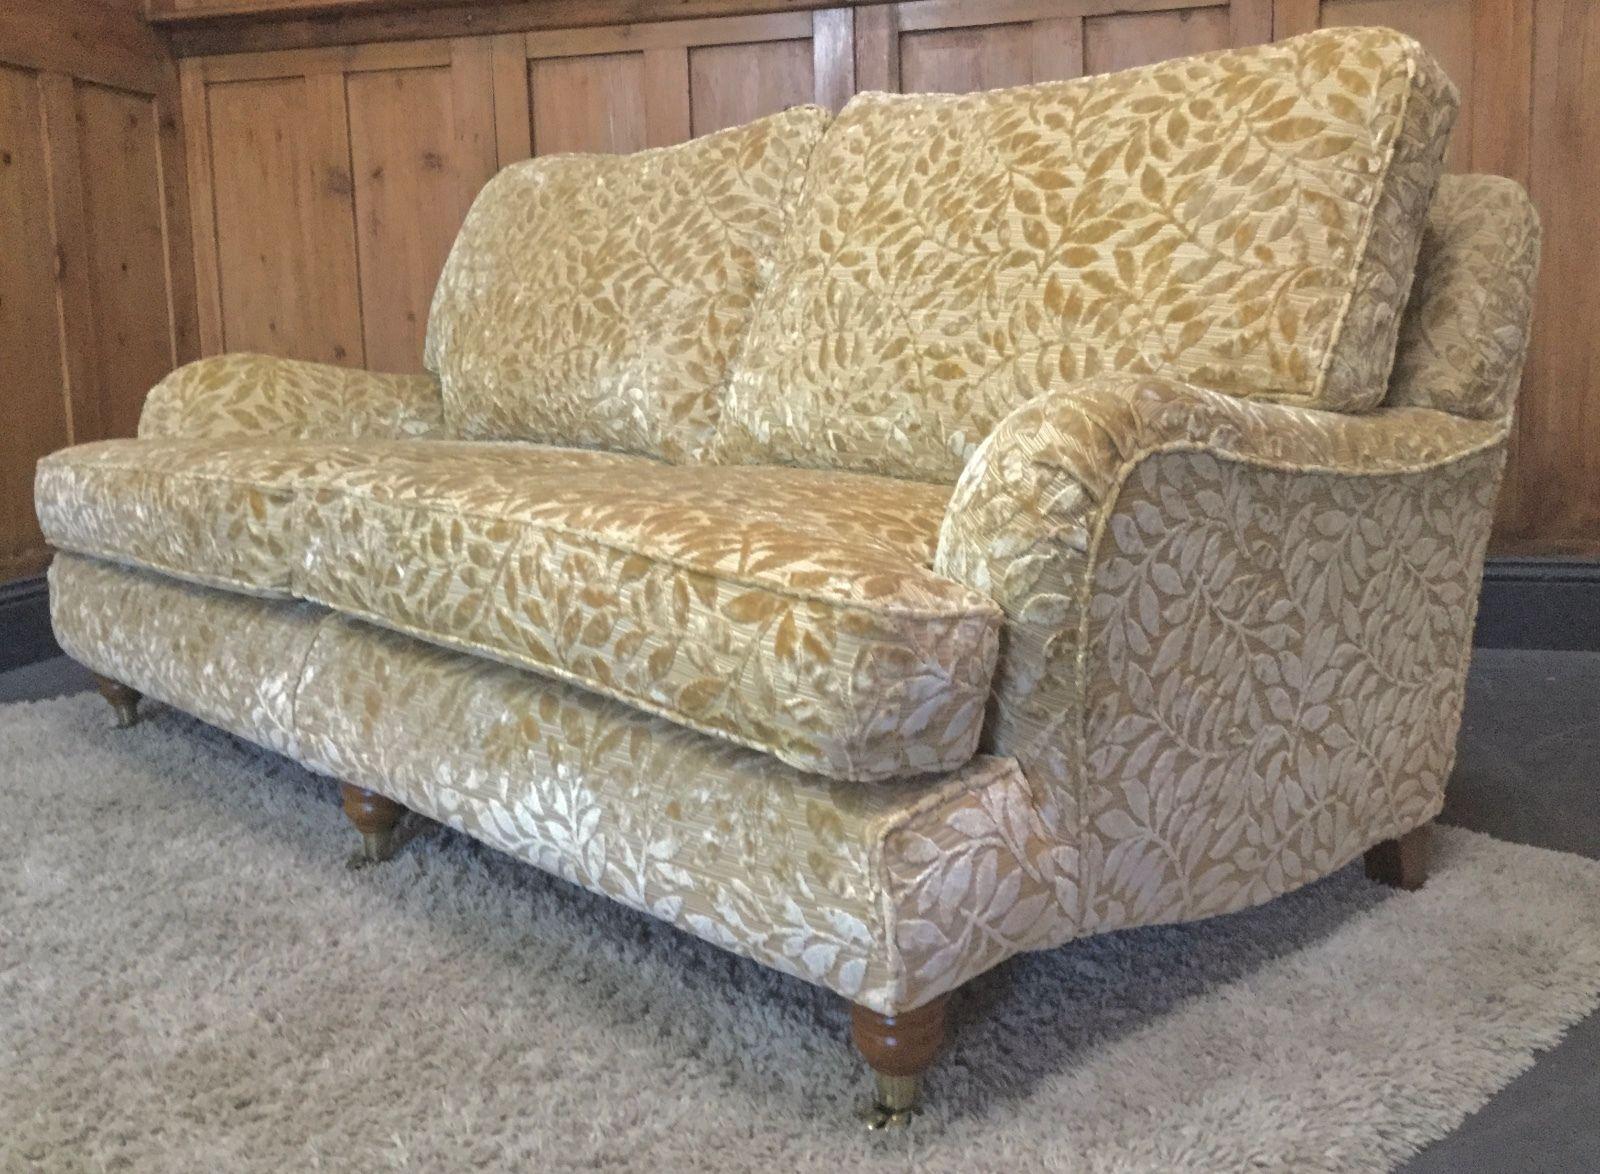 Multiyork Verona Howard Design Sofa On Solid Turned Legs Castors In Home Furniture Diy Sofas Armchairs Suites Ebay